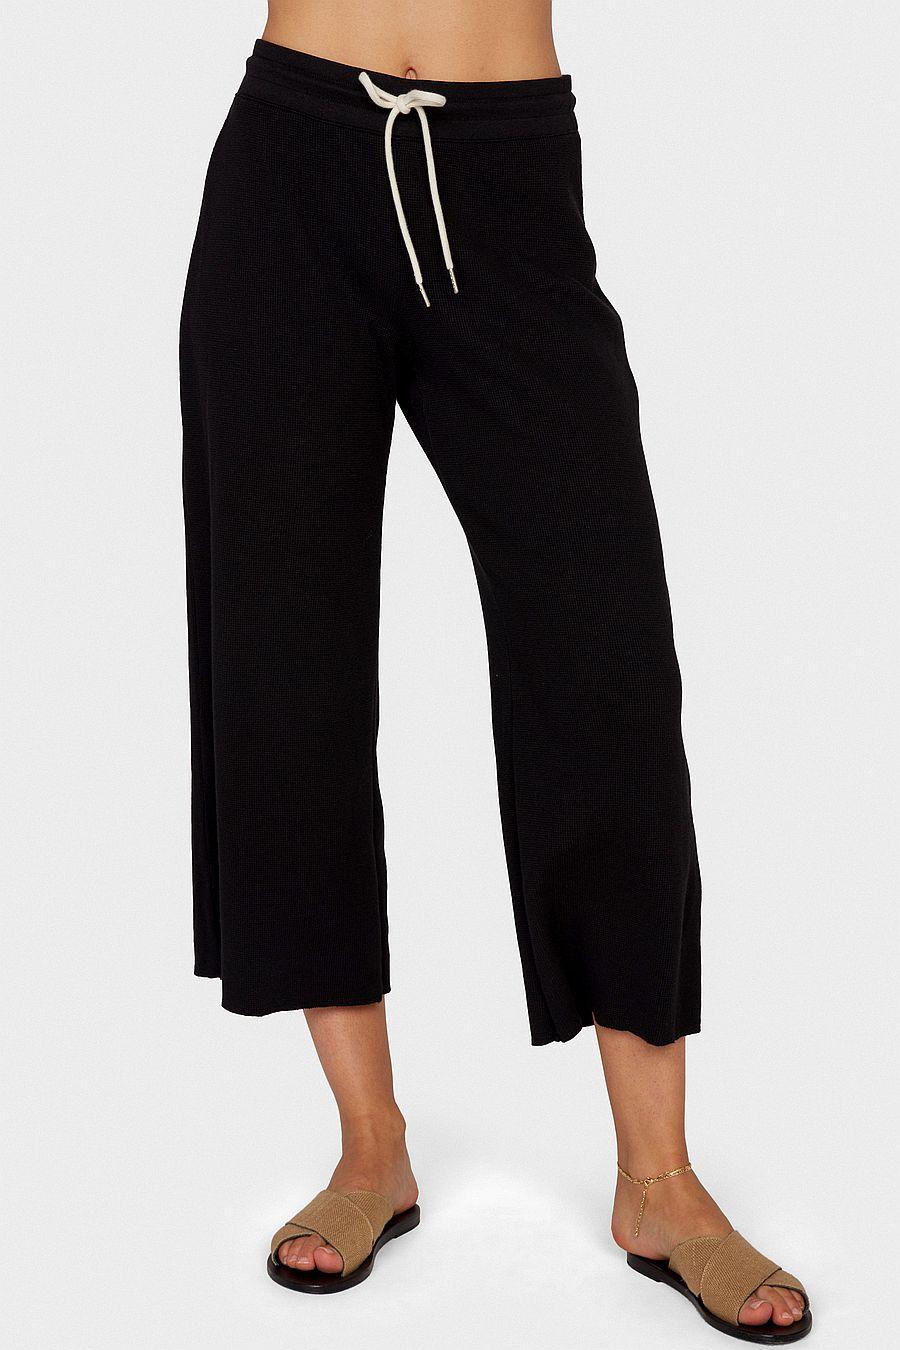 MATE The Label Organic Thermal Wide Leg Pant - JET BLACK